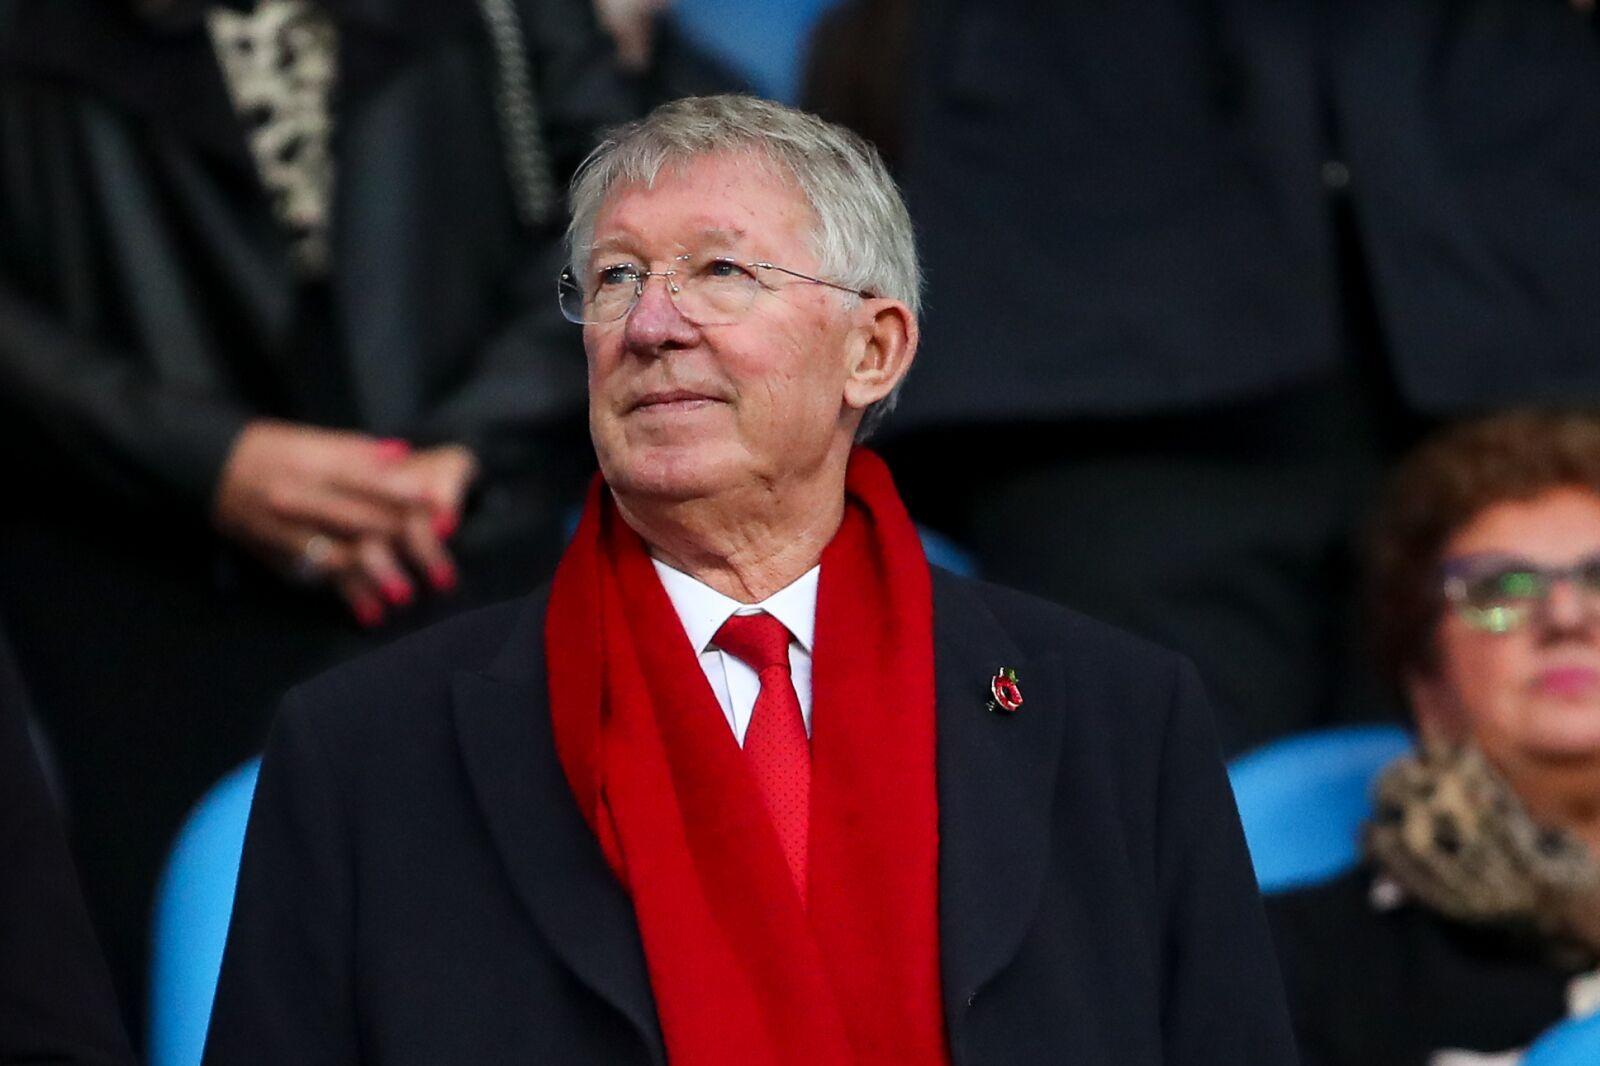 Manchester United: On the news regarding Sir Alex Ferguson